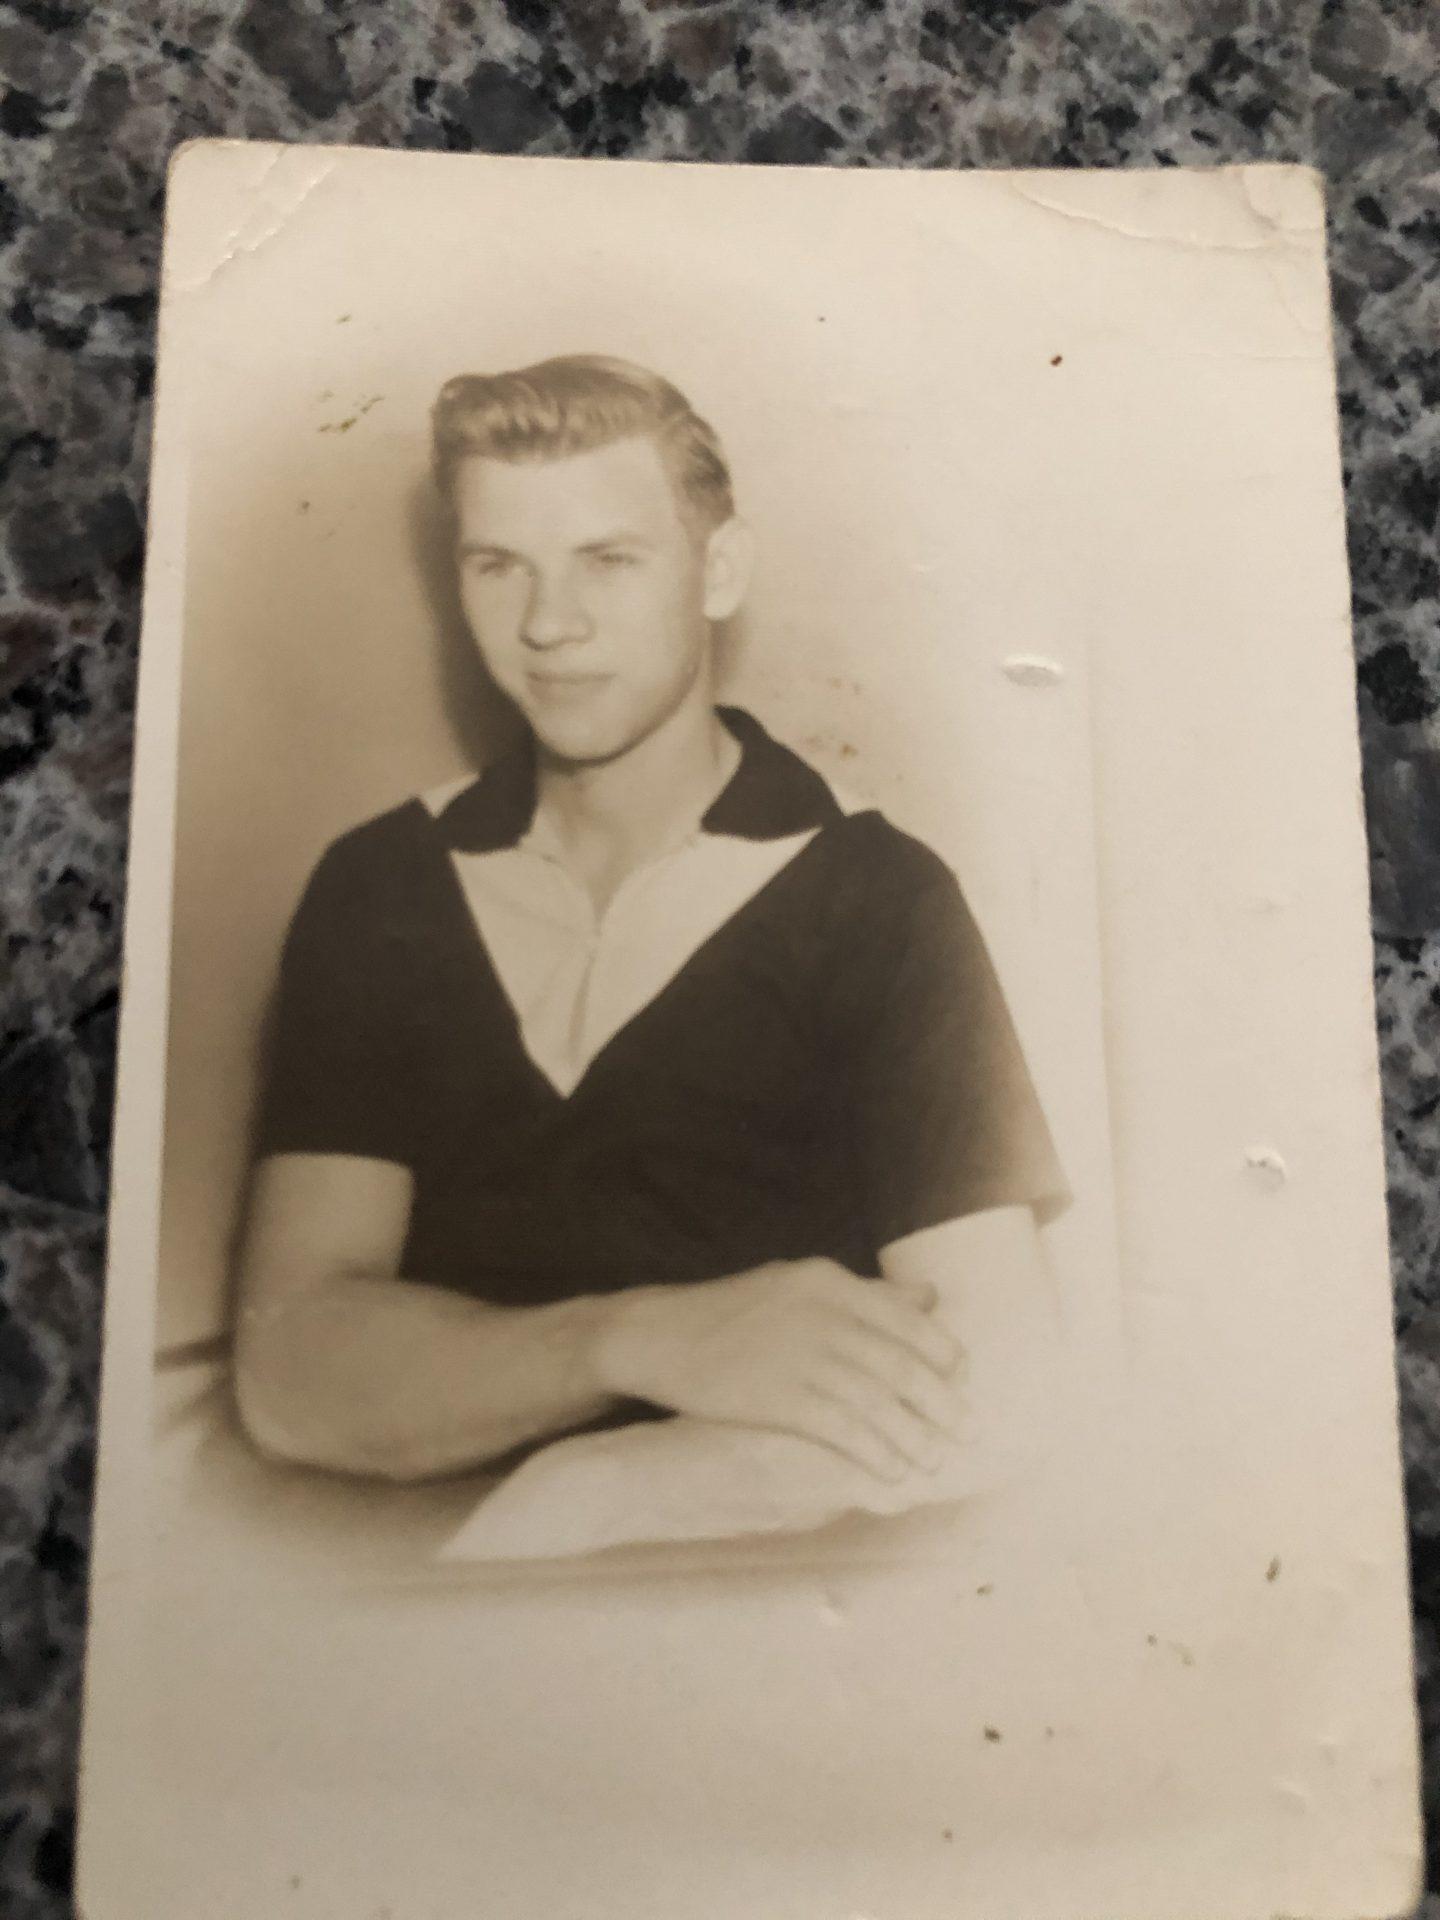 Dad in his early twenties